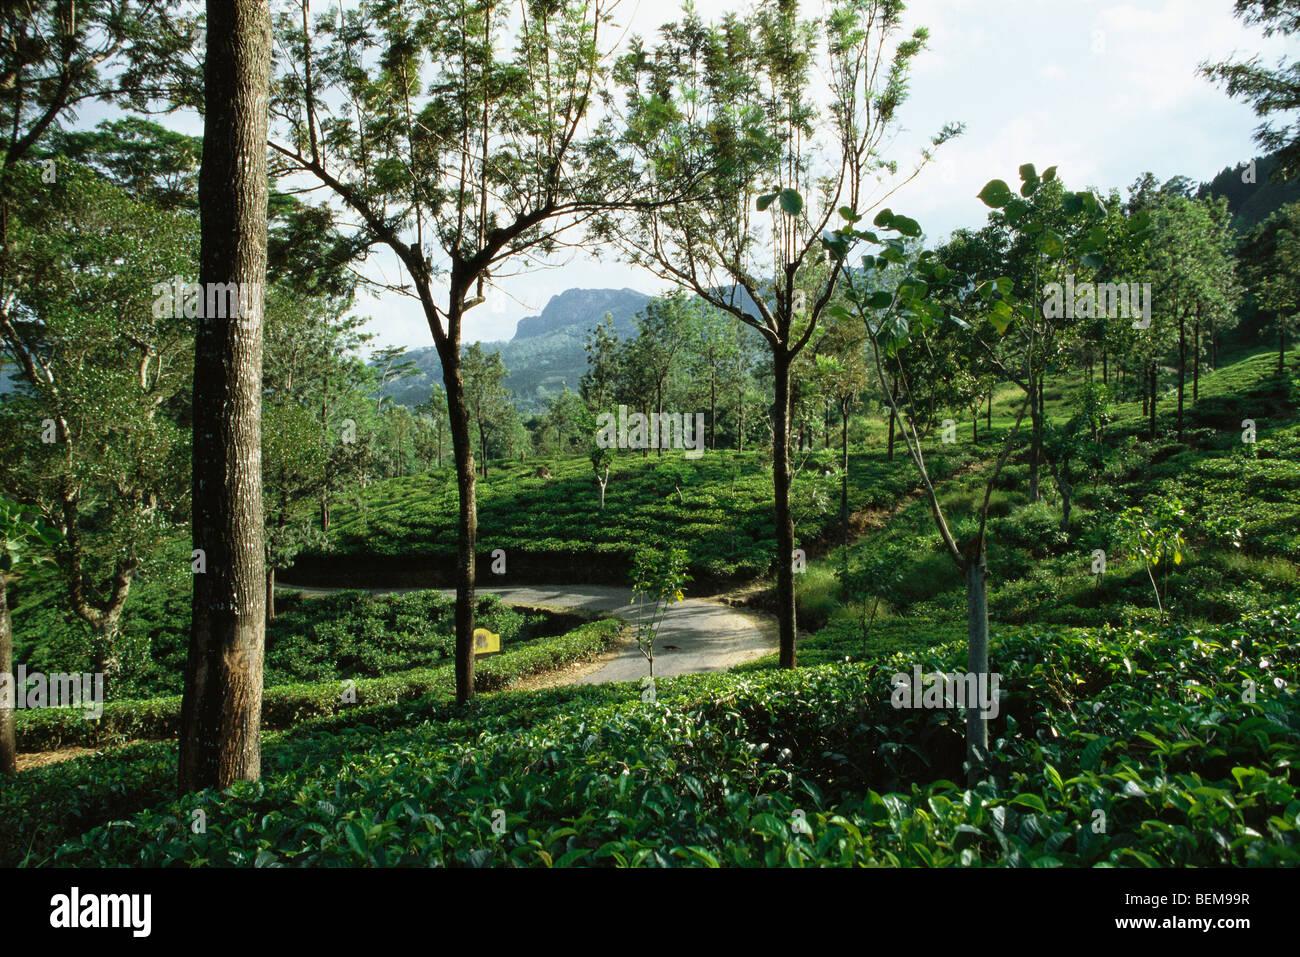 Tea plantation, mongoose crossing path in distance, Darjeeling, India - Stock Image